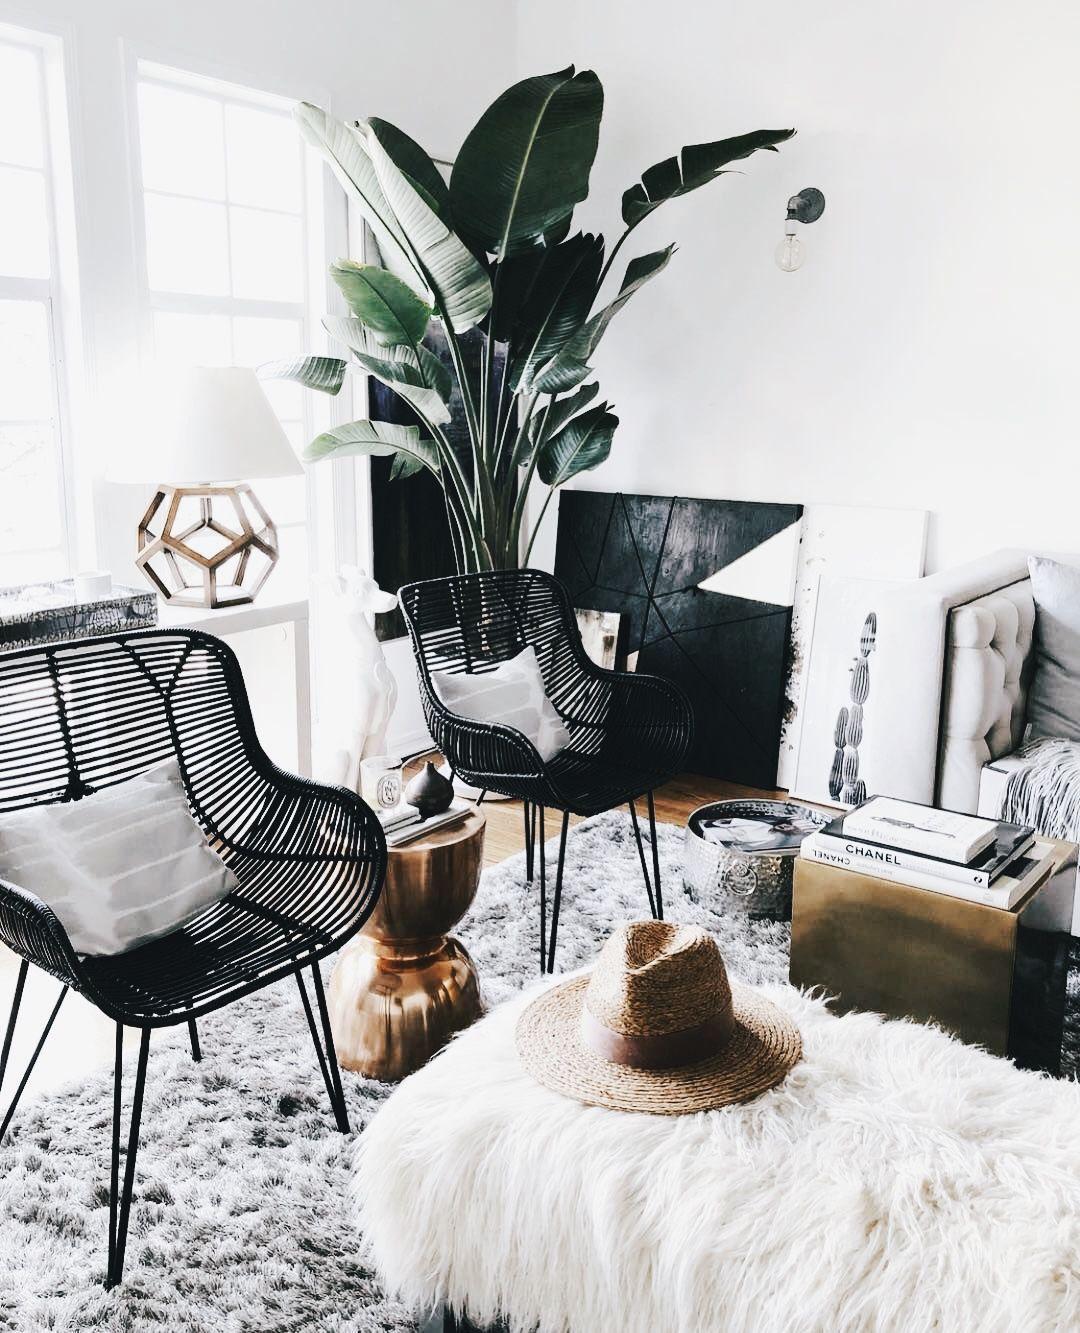 Pinterest Living Room Decor: Home Decor, Decor